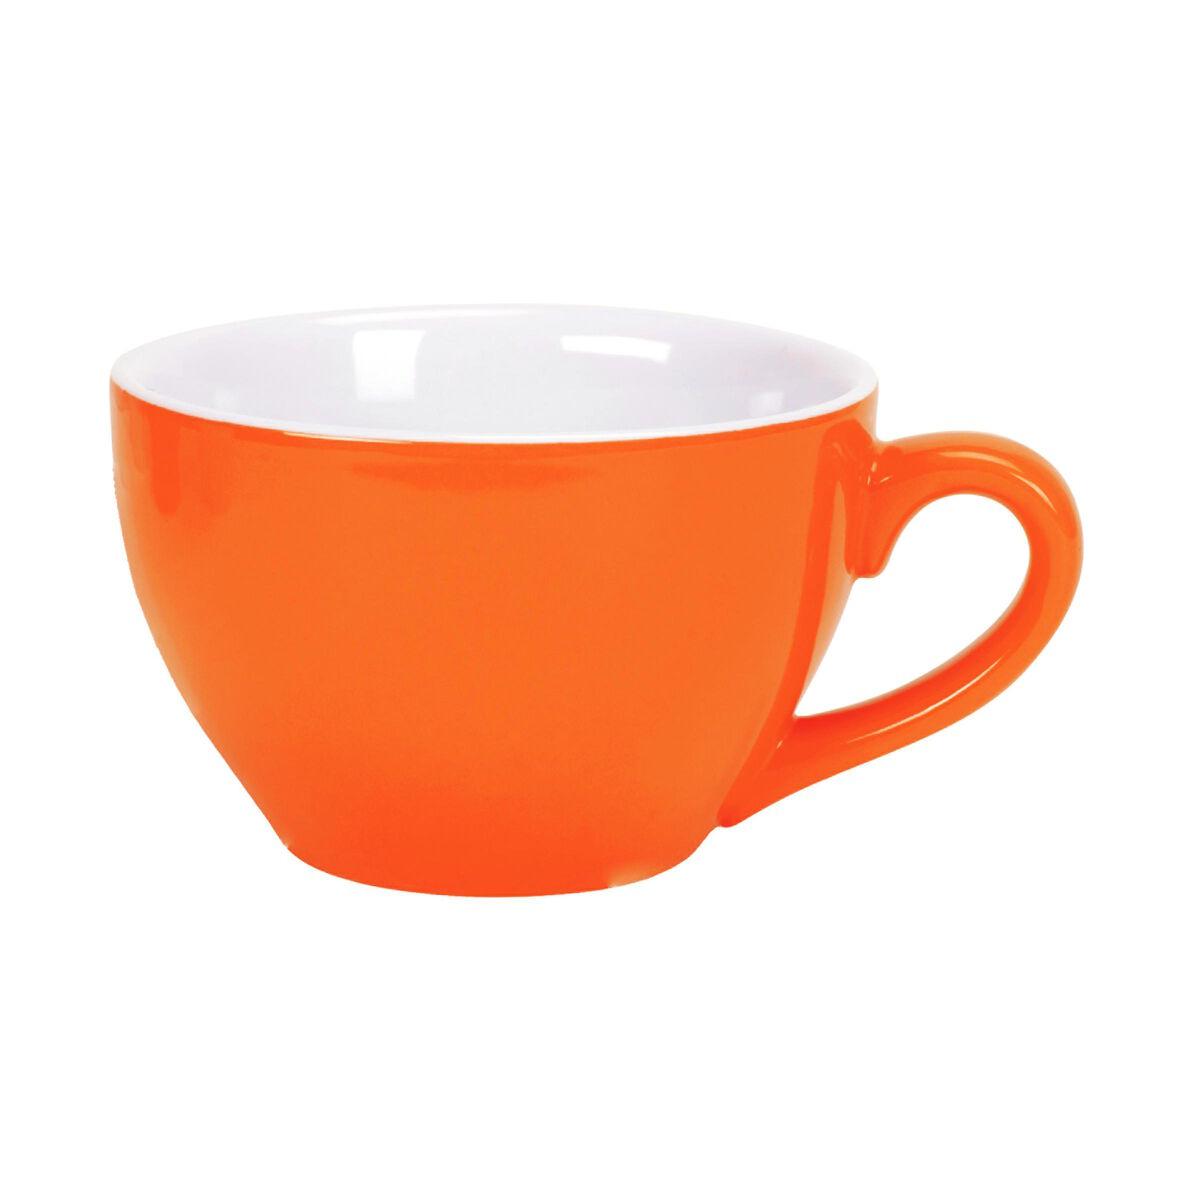 MIX IT! Kaffeetasse orange 28cl